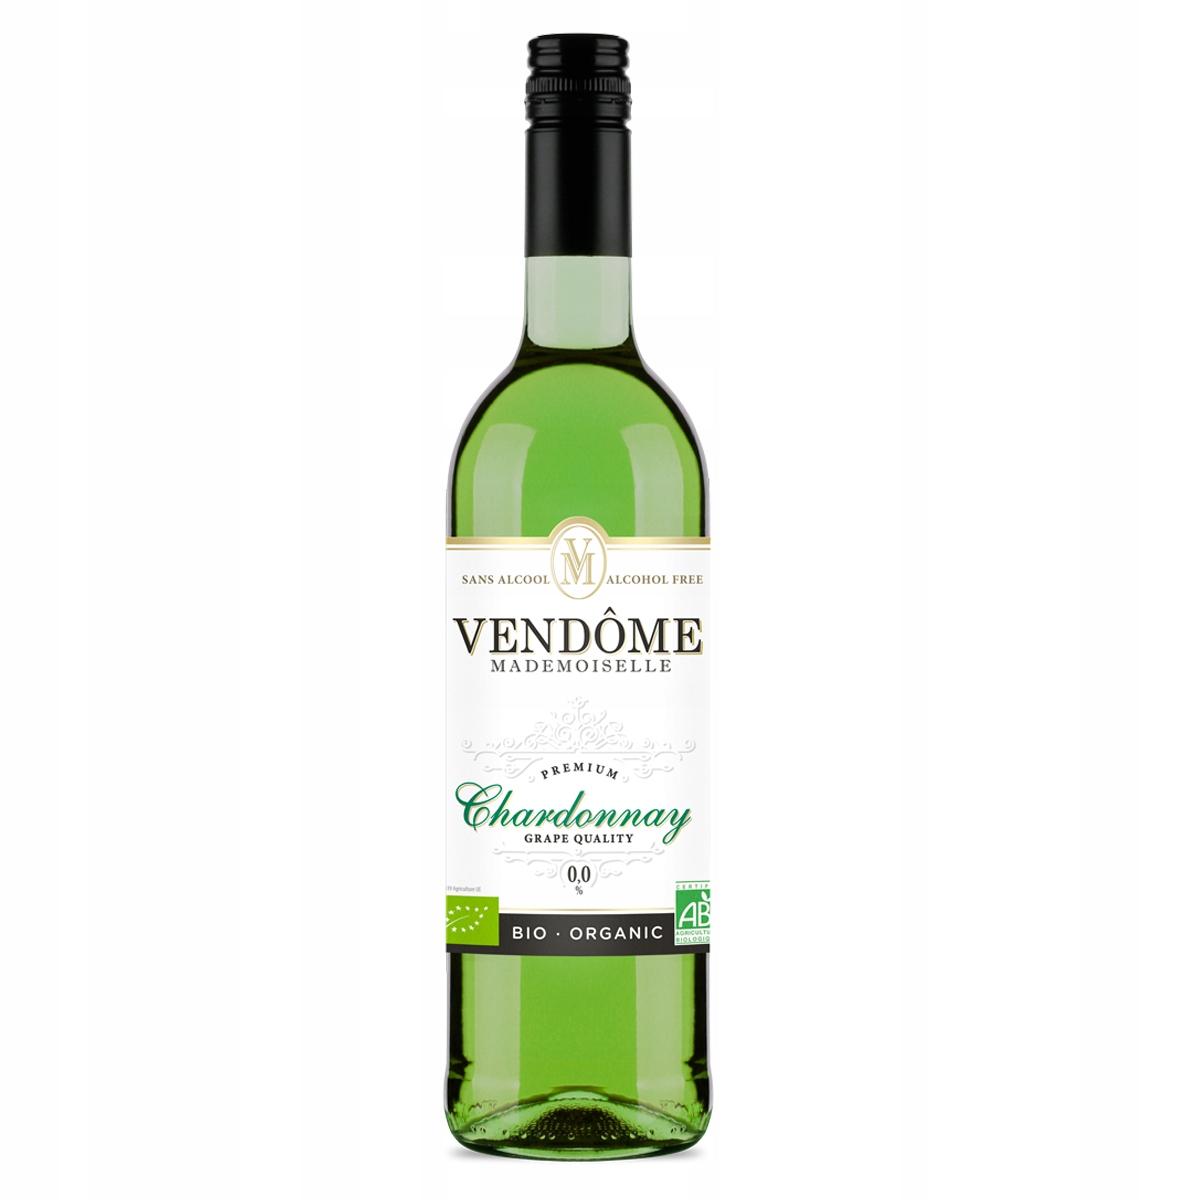 Item Non-Alcoholic Wine Vendome Mademoiselle Chardonnay